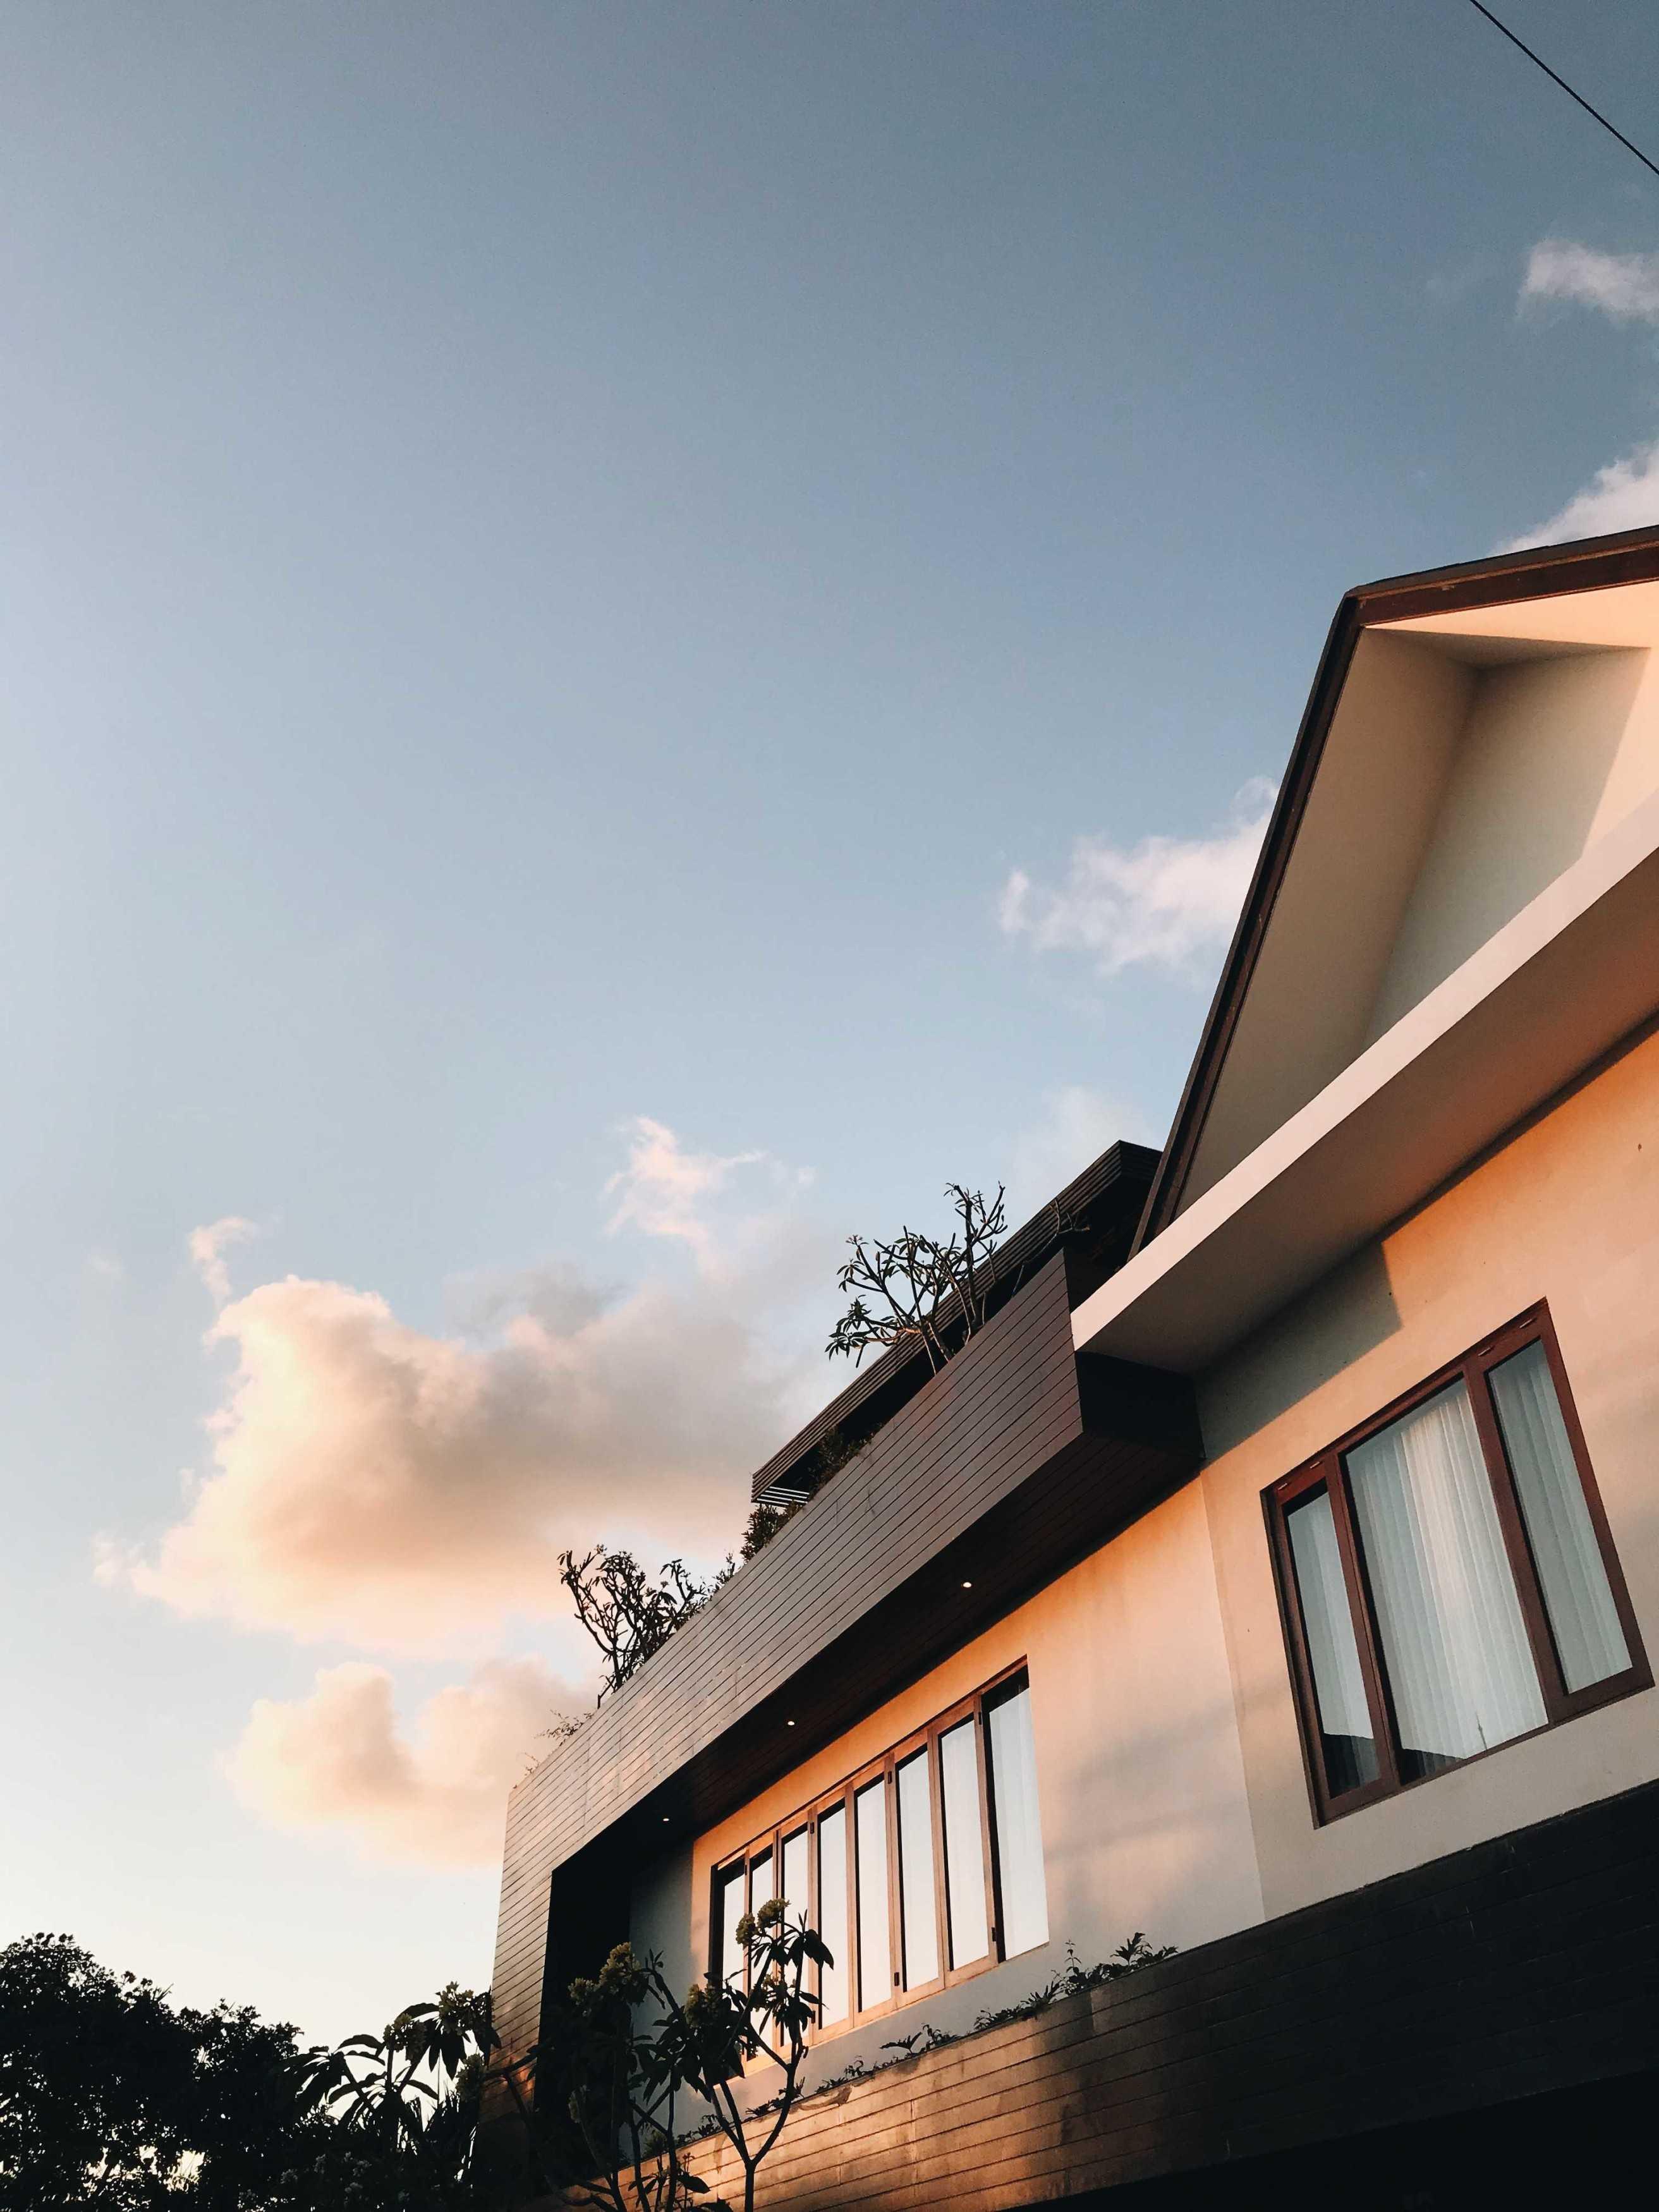 Sequal Design & Construction A Six Villa Canggu, Kec. Kuta Utara, Kabupaten Badung, Bali, Indonesia Canggu, Kec. Kuta Utara, Kabupaten Badung, Bali, Indonesia Sequal-Design-A-Six-Villa   112214